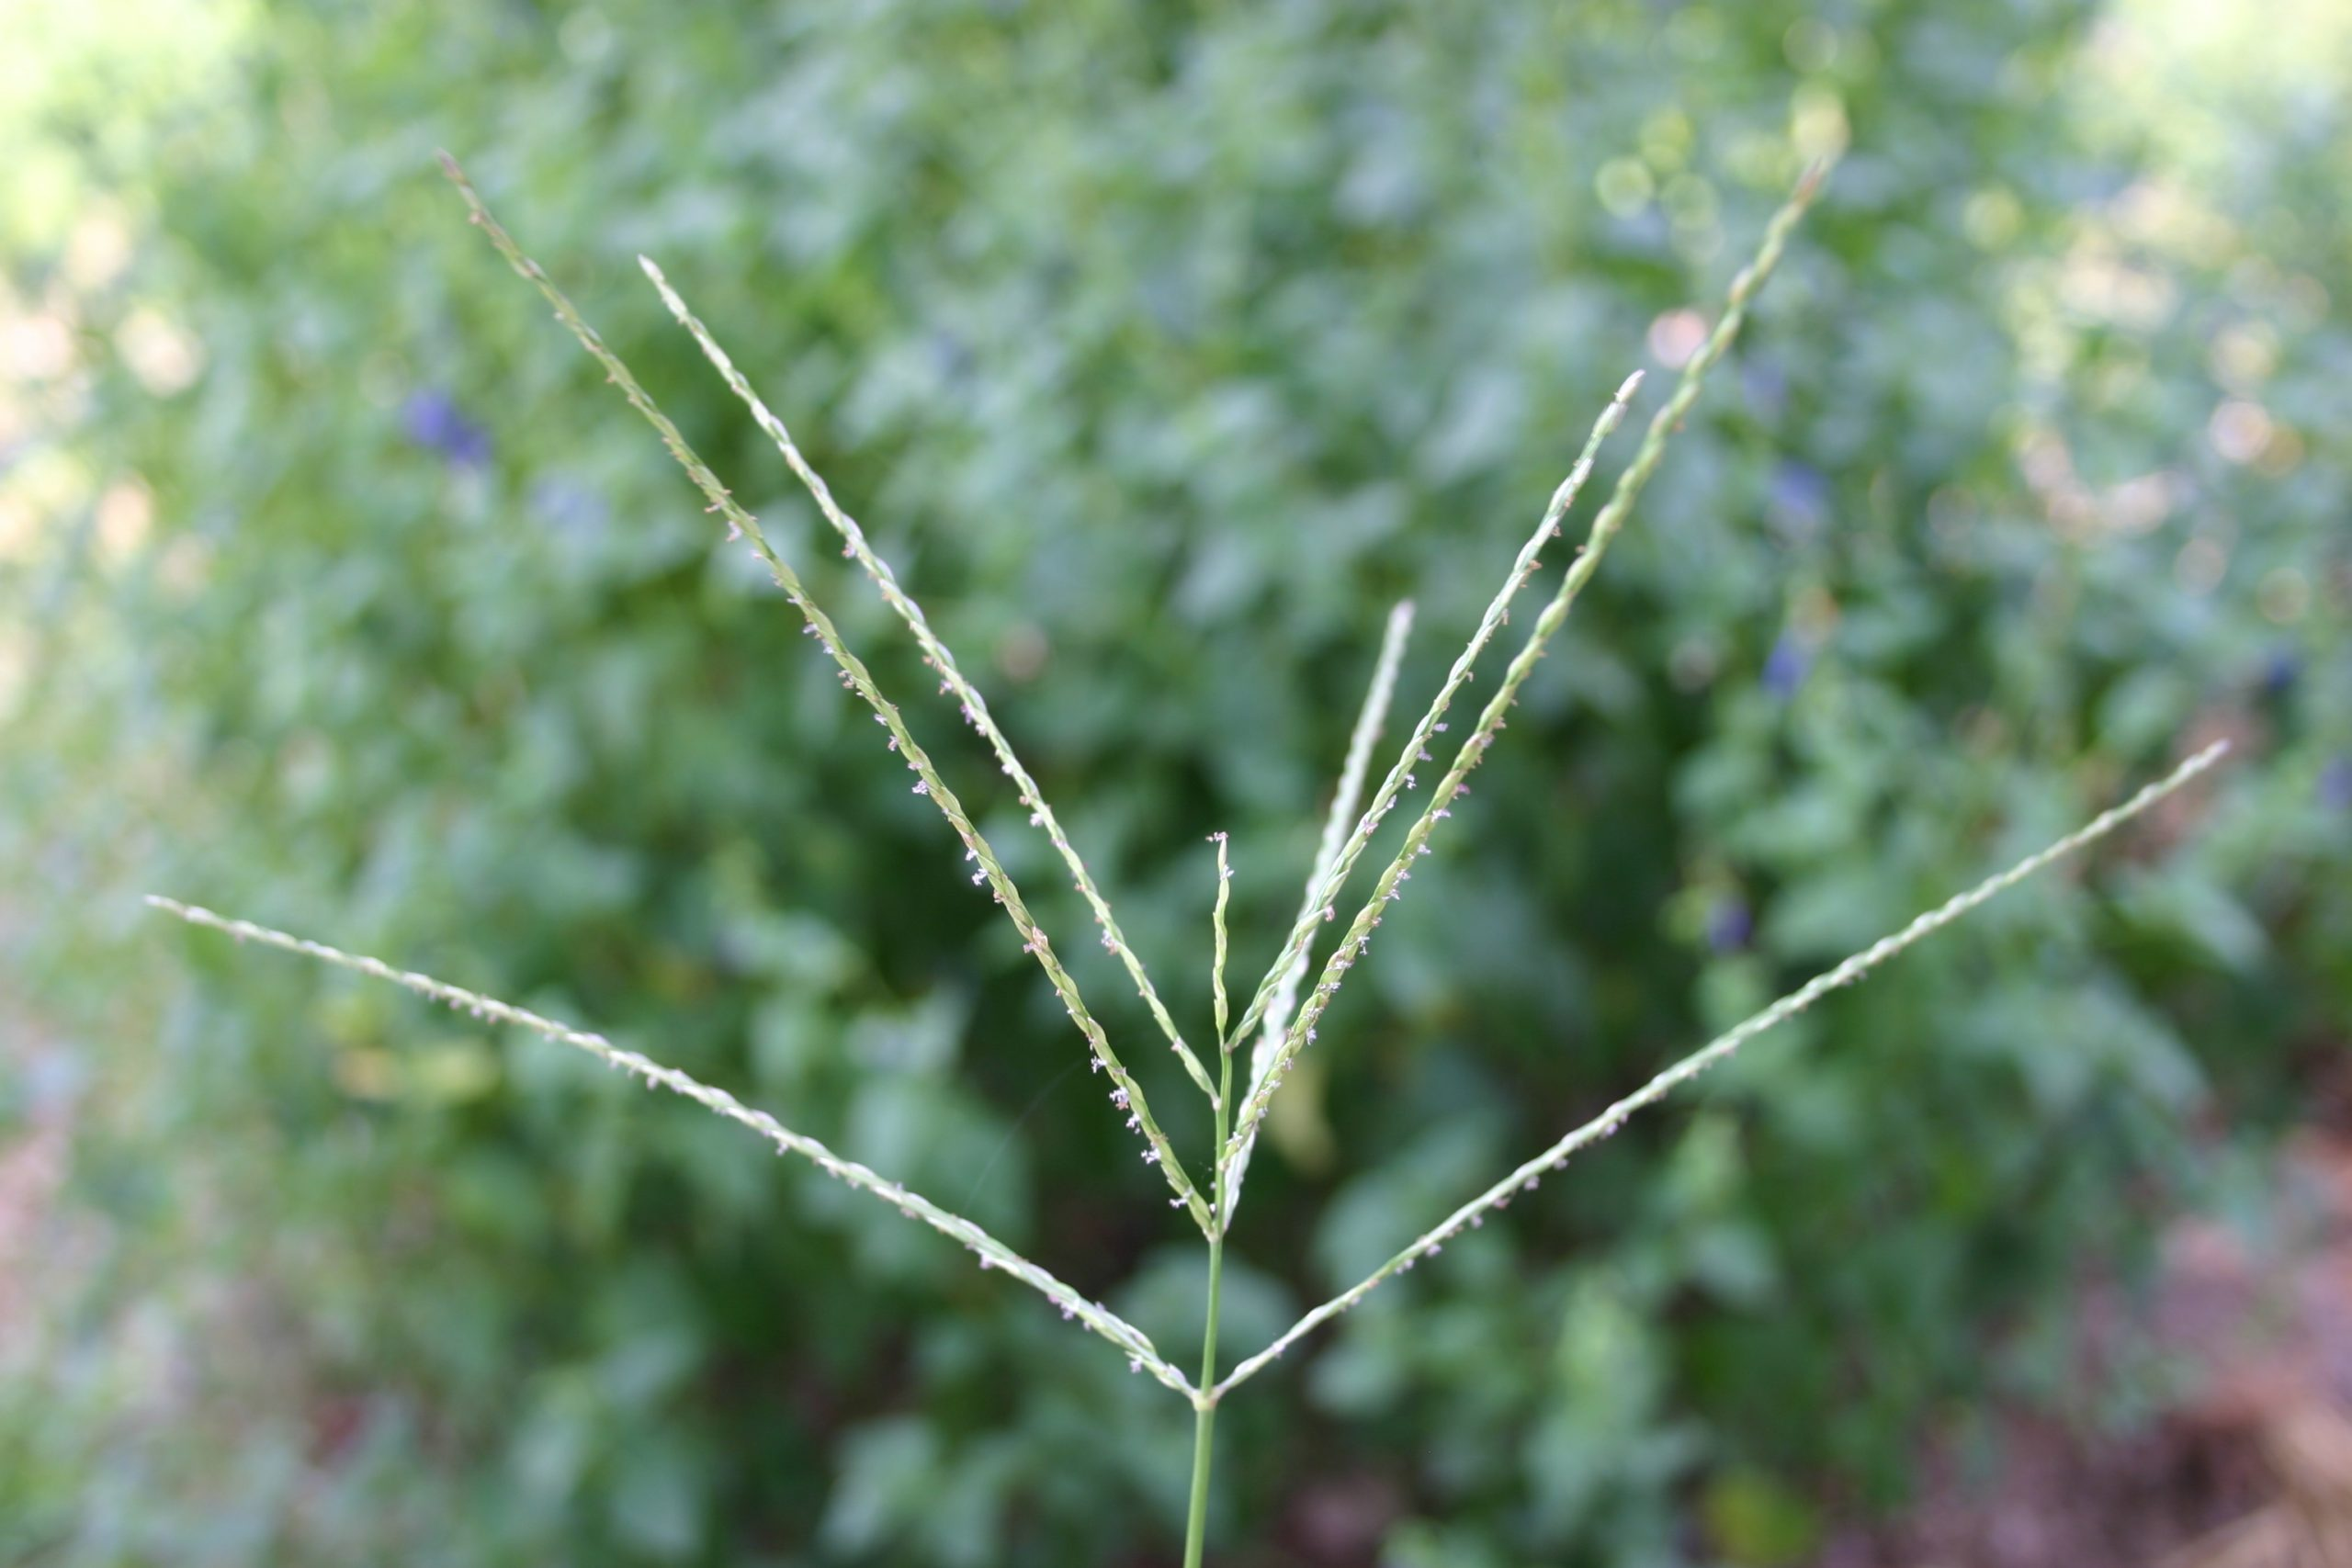 crabgrass seedhead